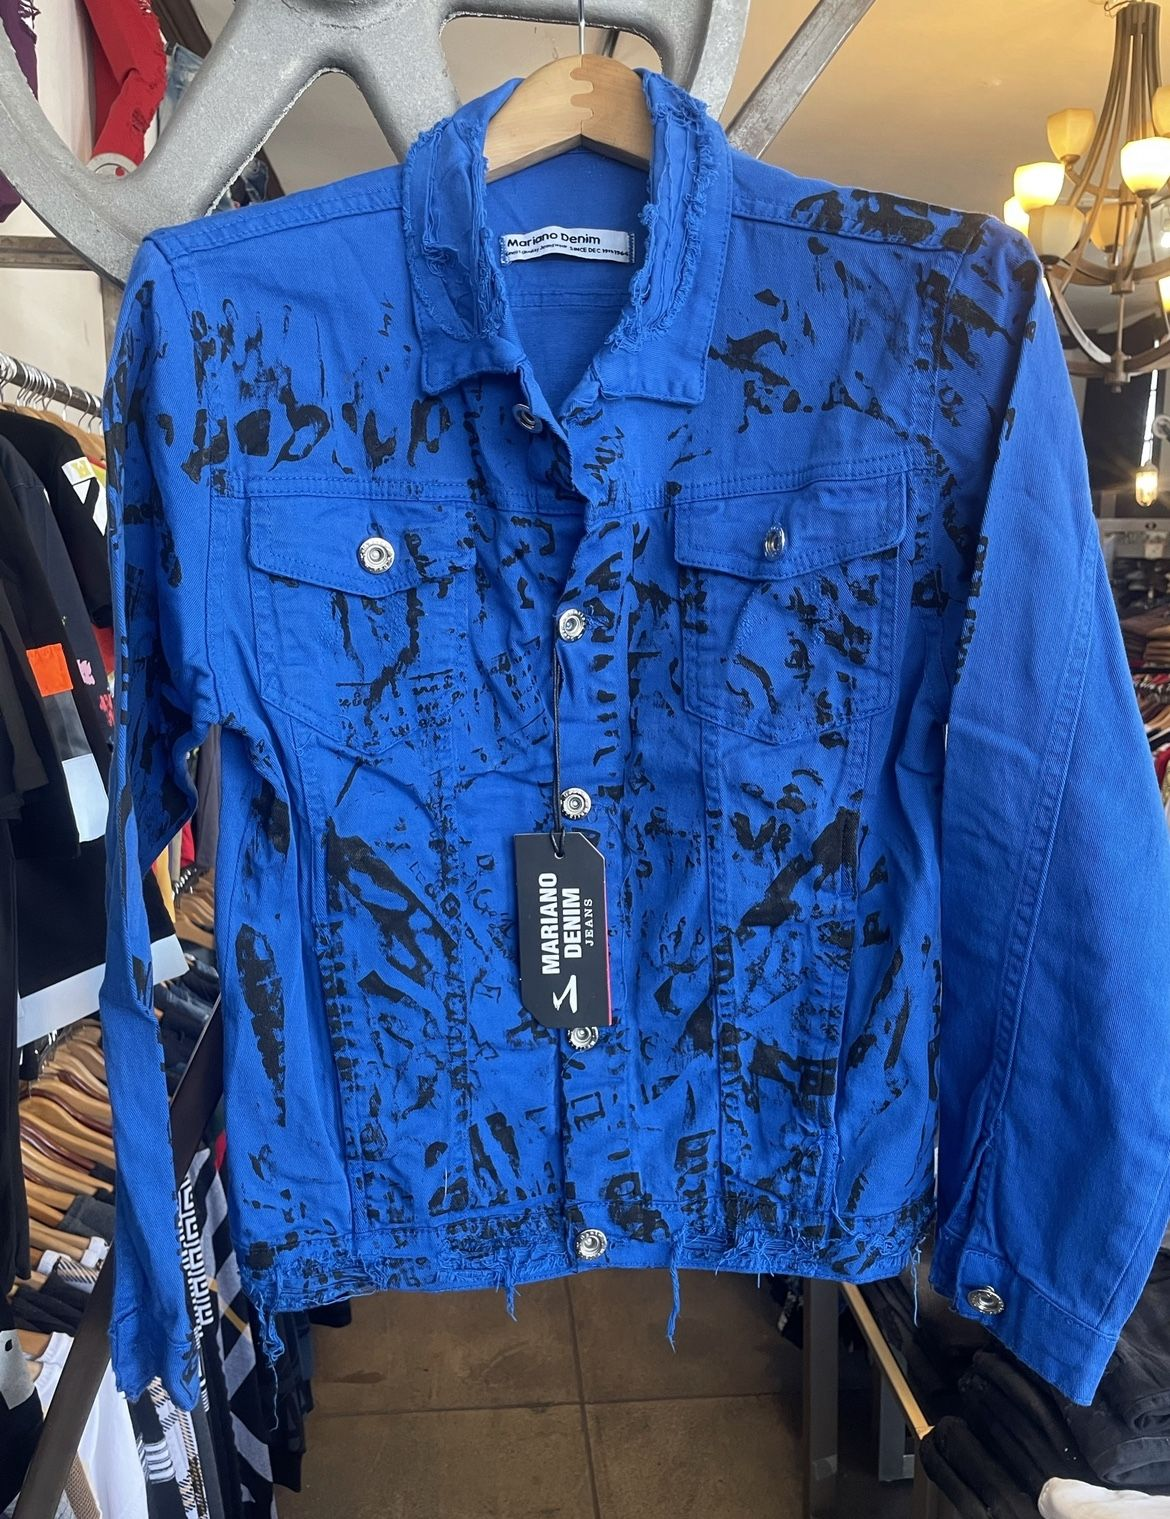 Men's Blue Denim Jacket Sizes Small Medium Large XL STORE PICK UP